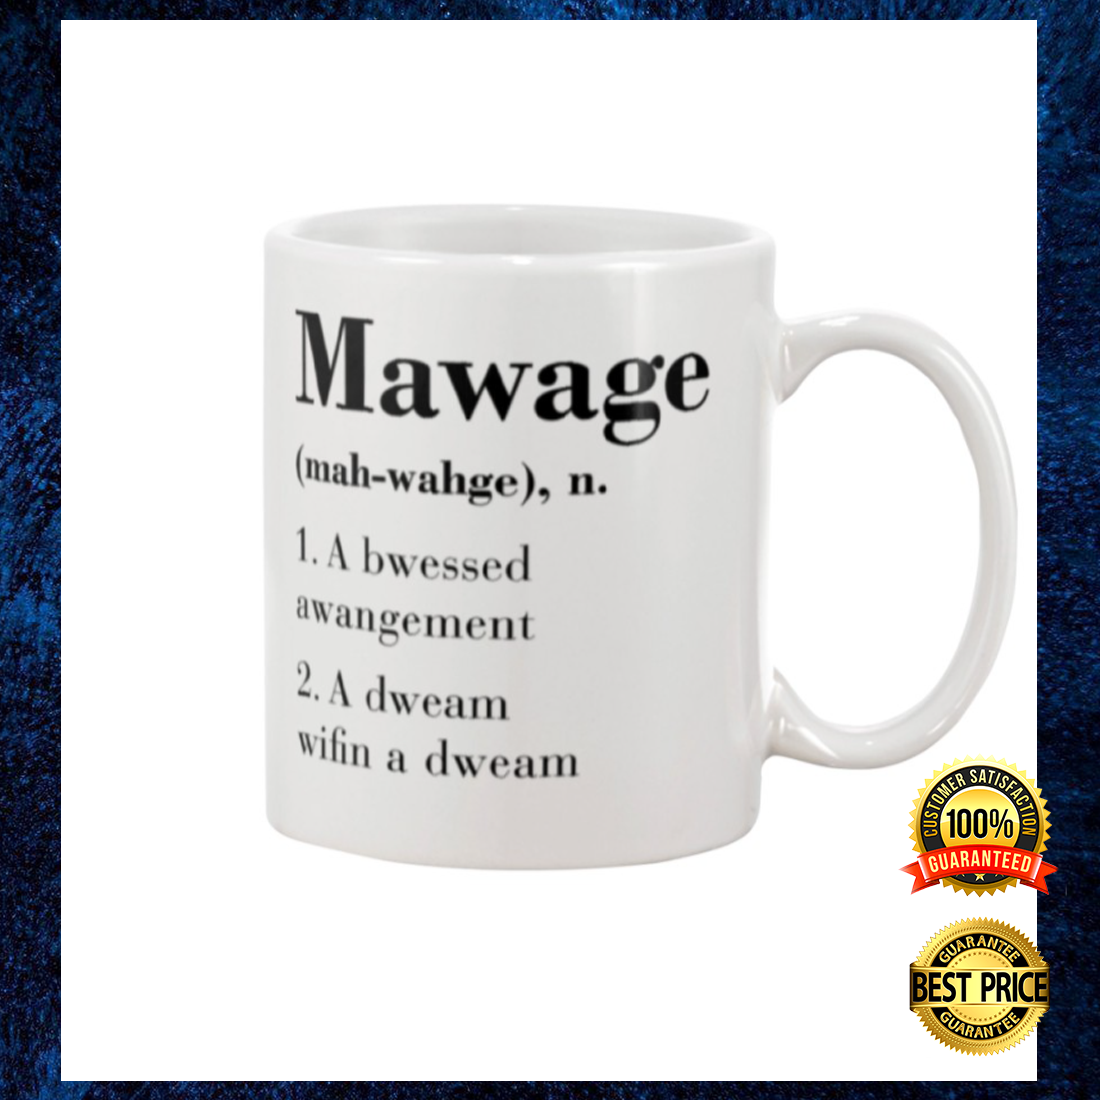 Mawage a bwessed awangement a dweam wifin a dweam mug 1